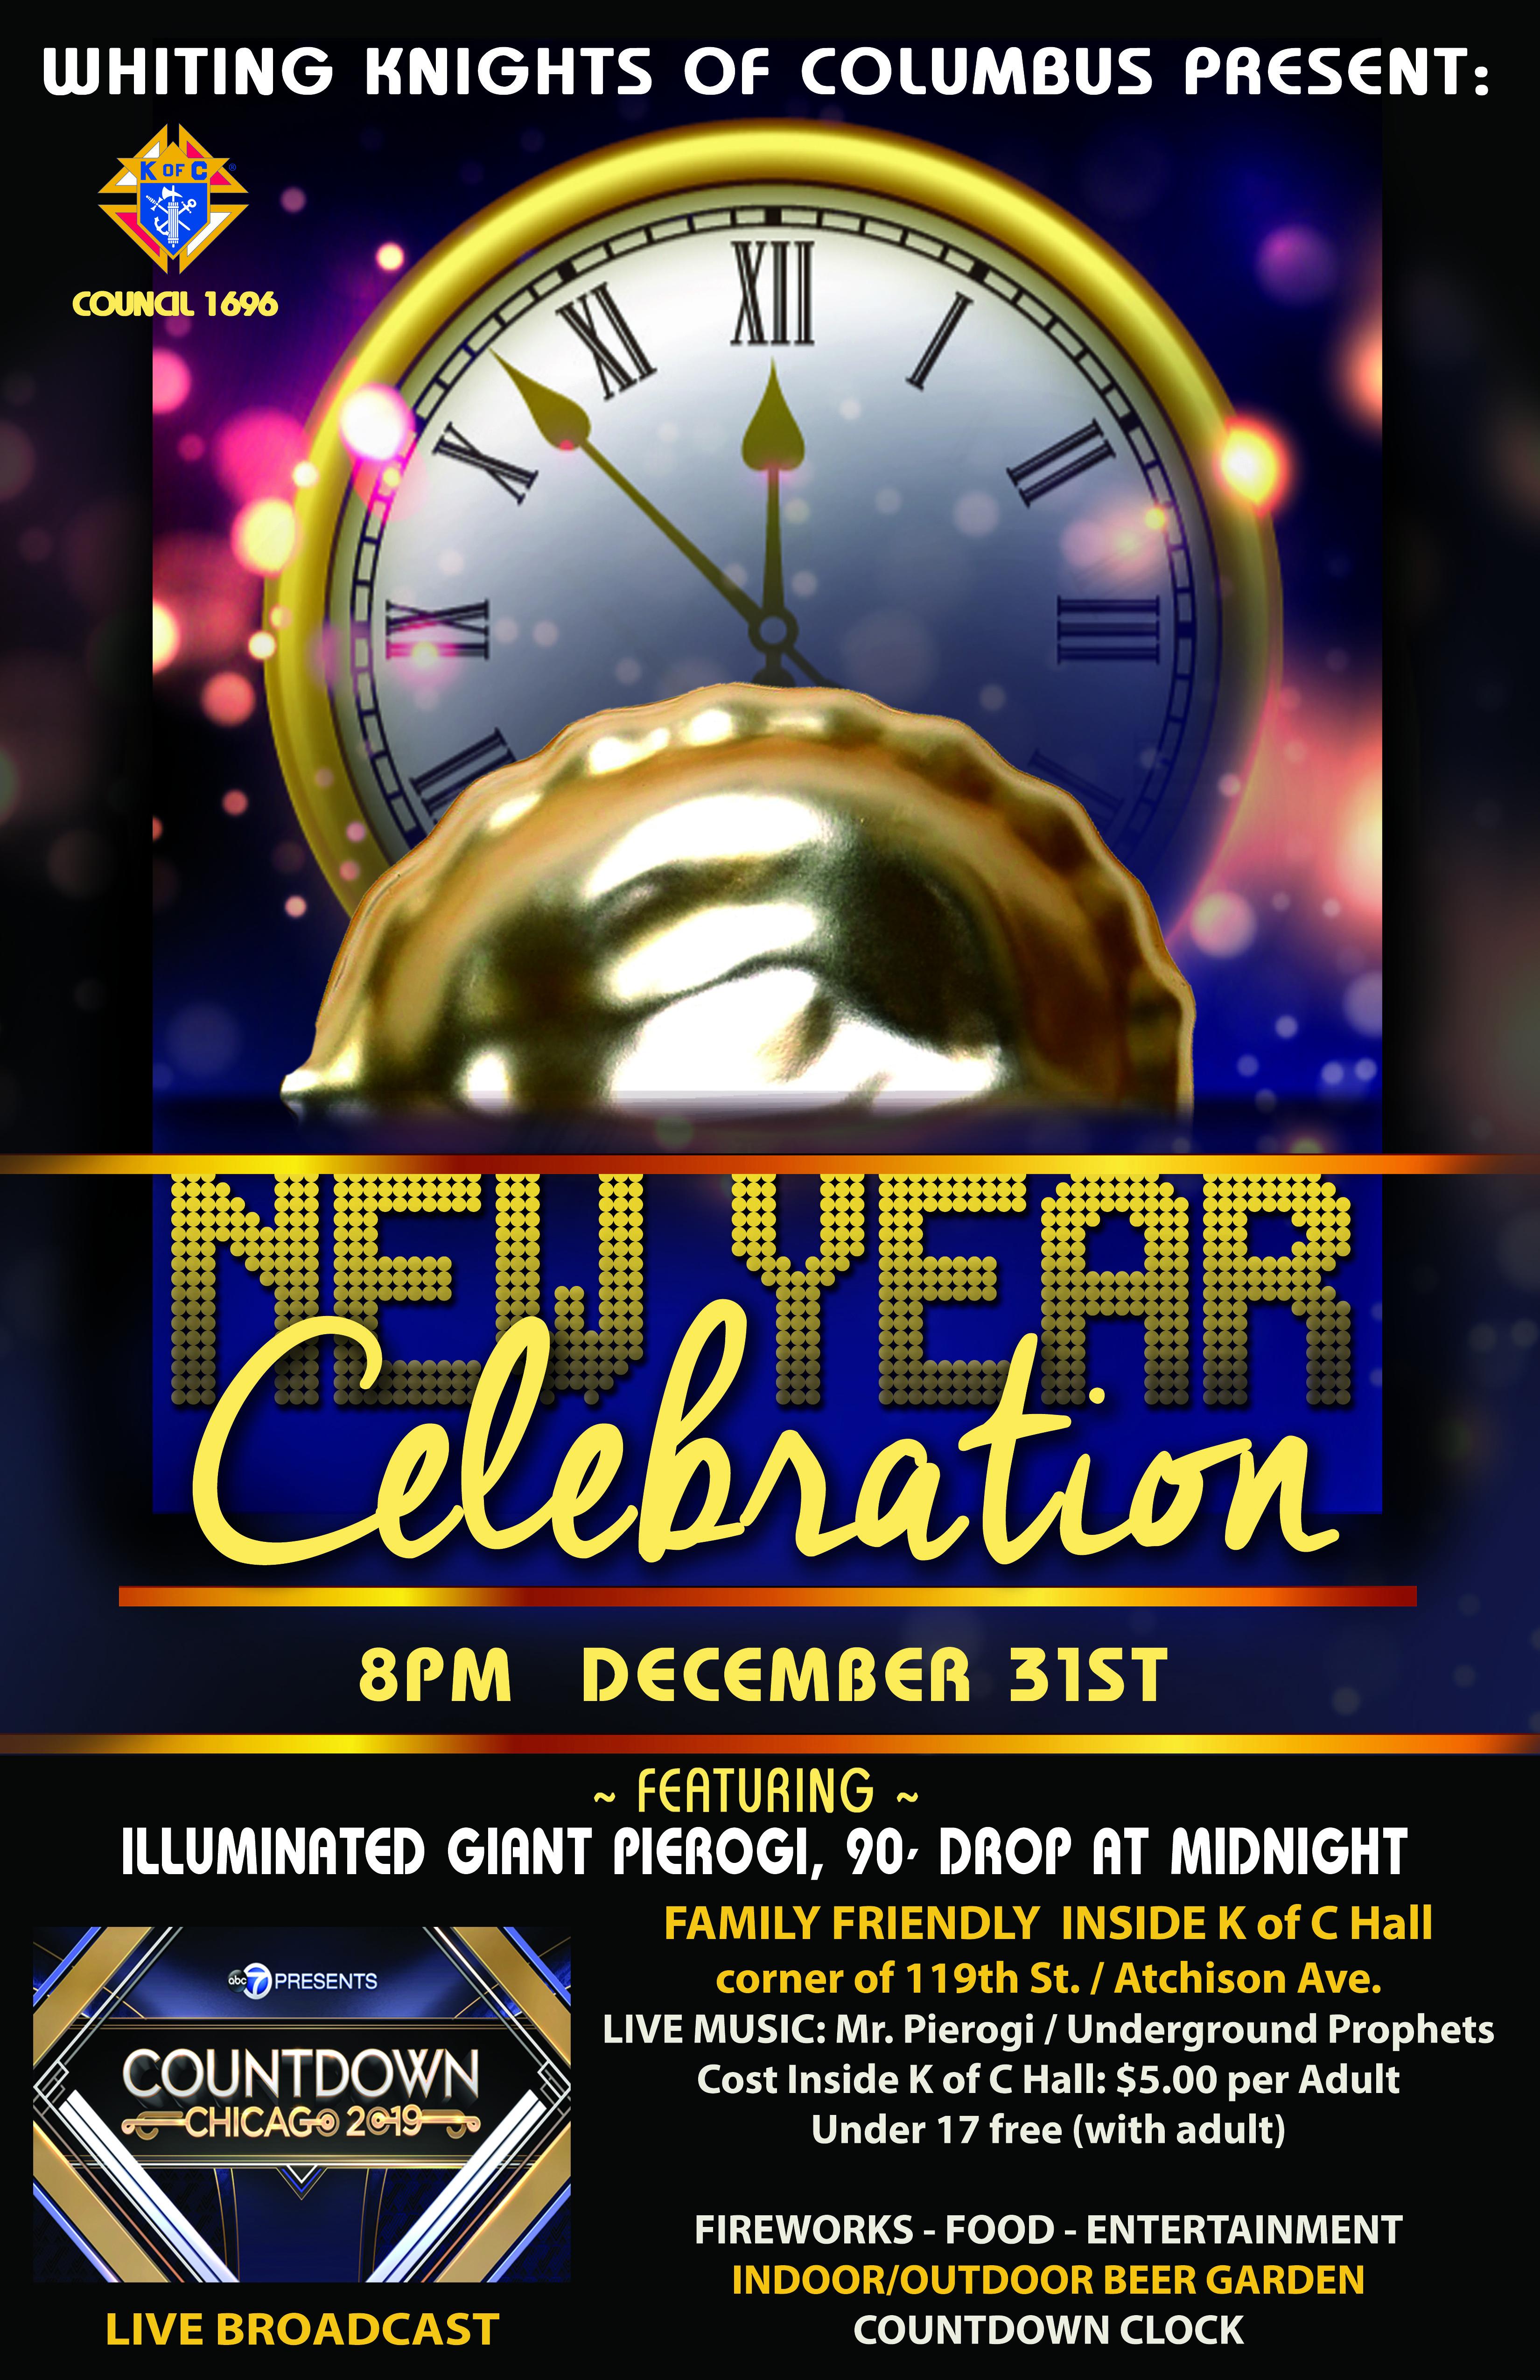 New years eve countdown clock video